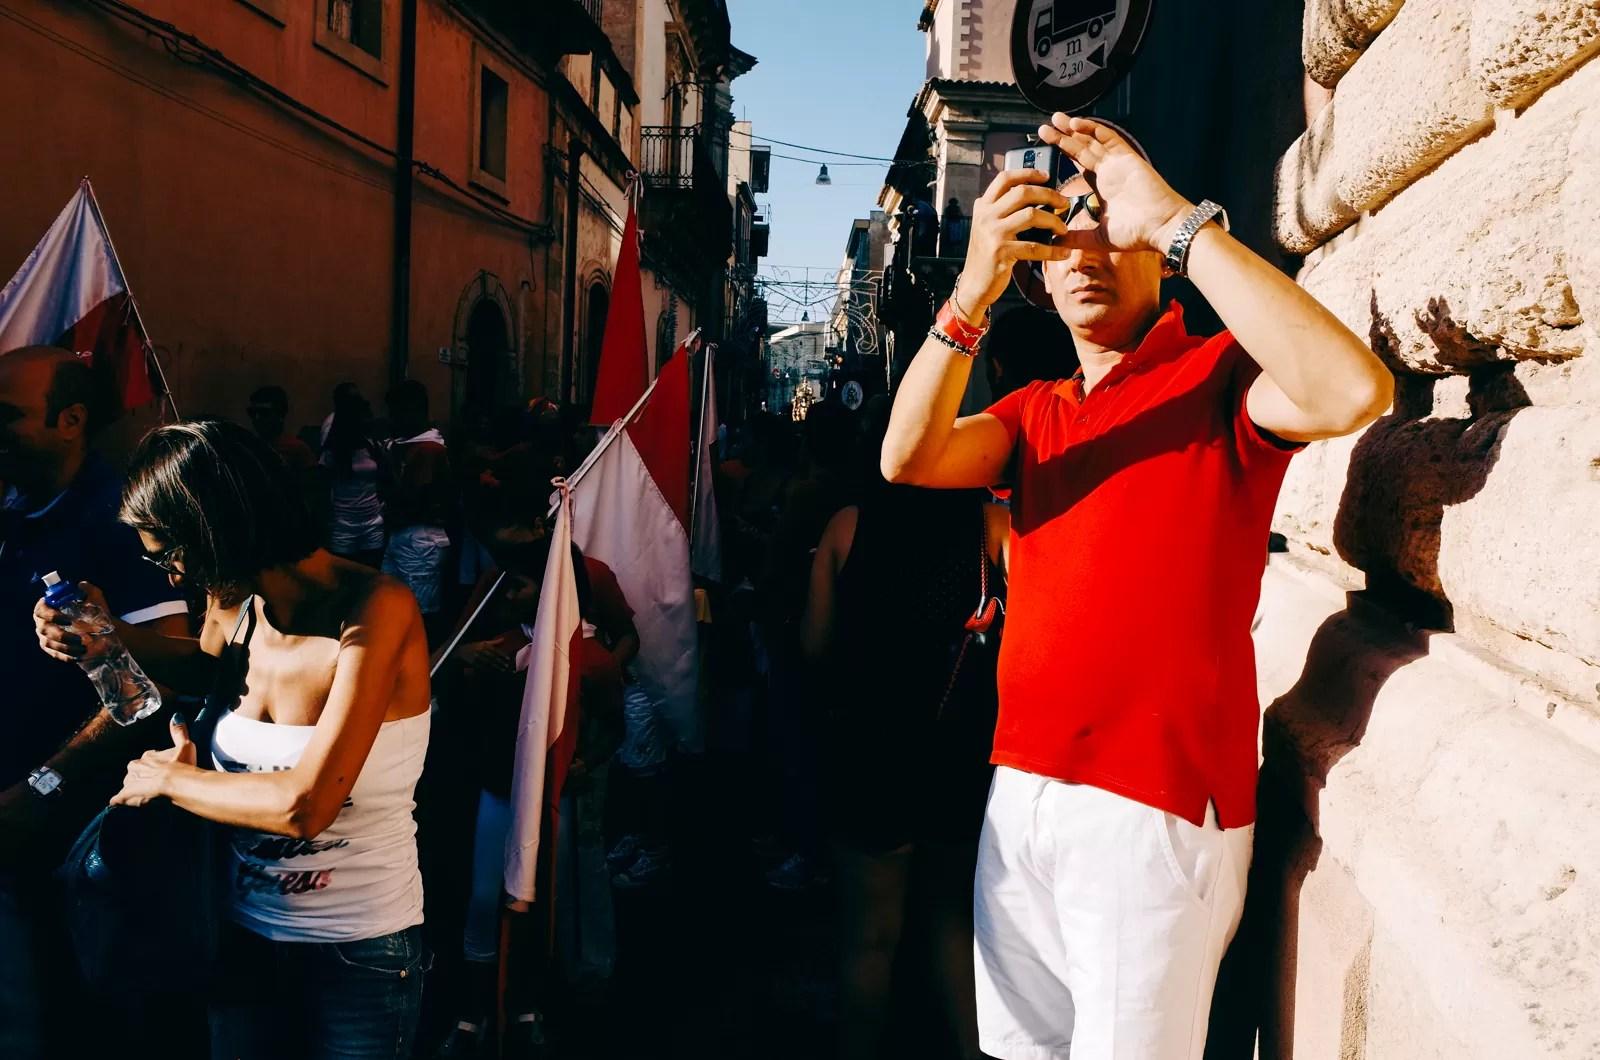 R0004795 - Siciliani in festa 18 Agosto 2015  (Parte 1) Street Photography Session - fotostreet.it